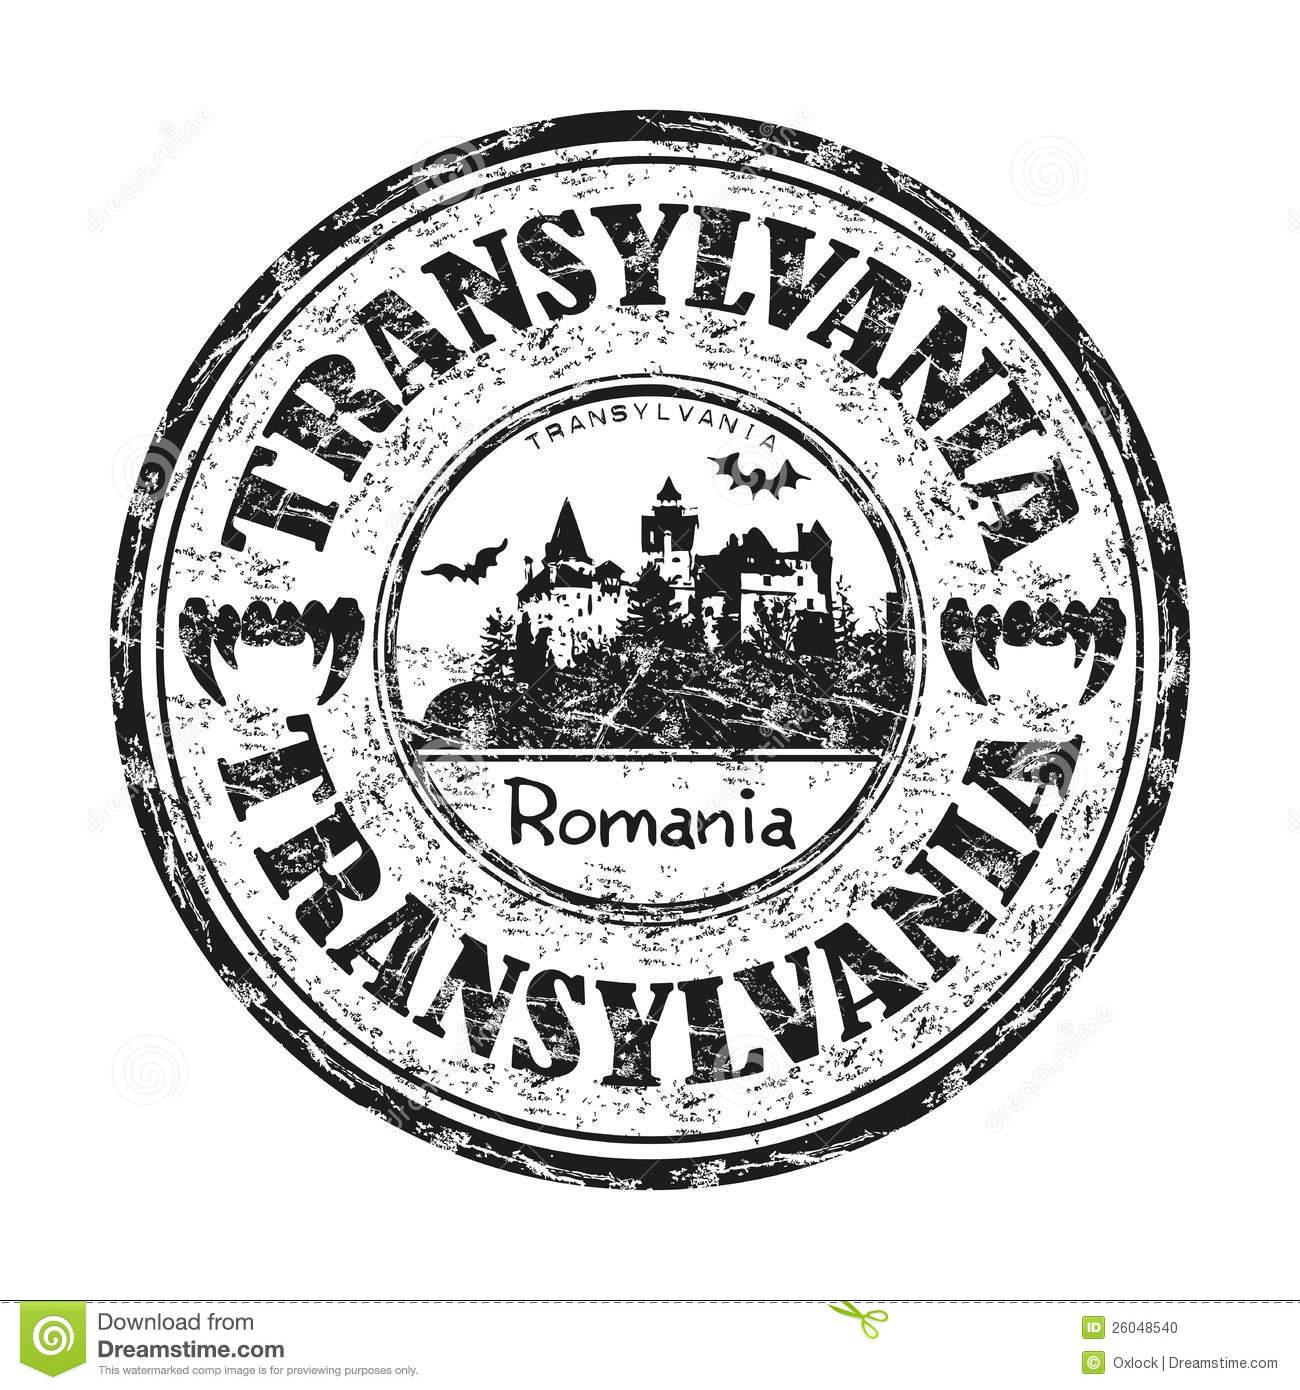 Transylvania Rubber Stamp Stock Photo.